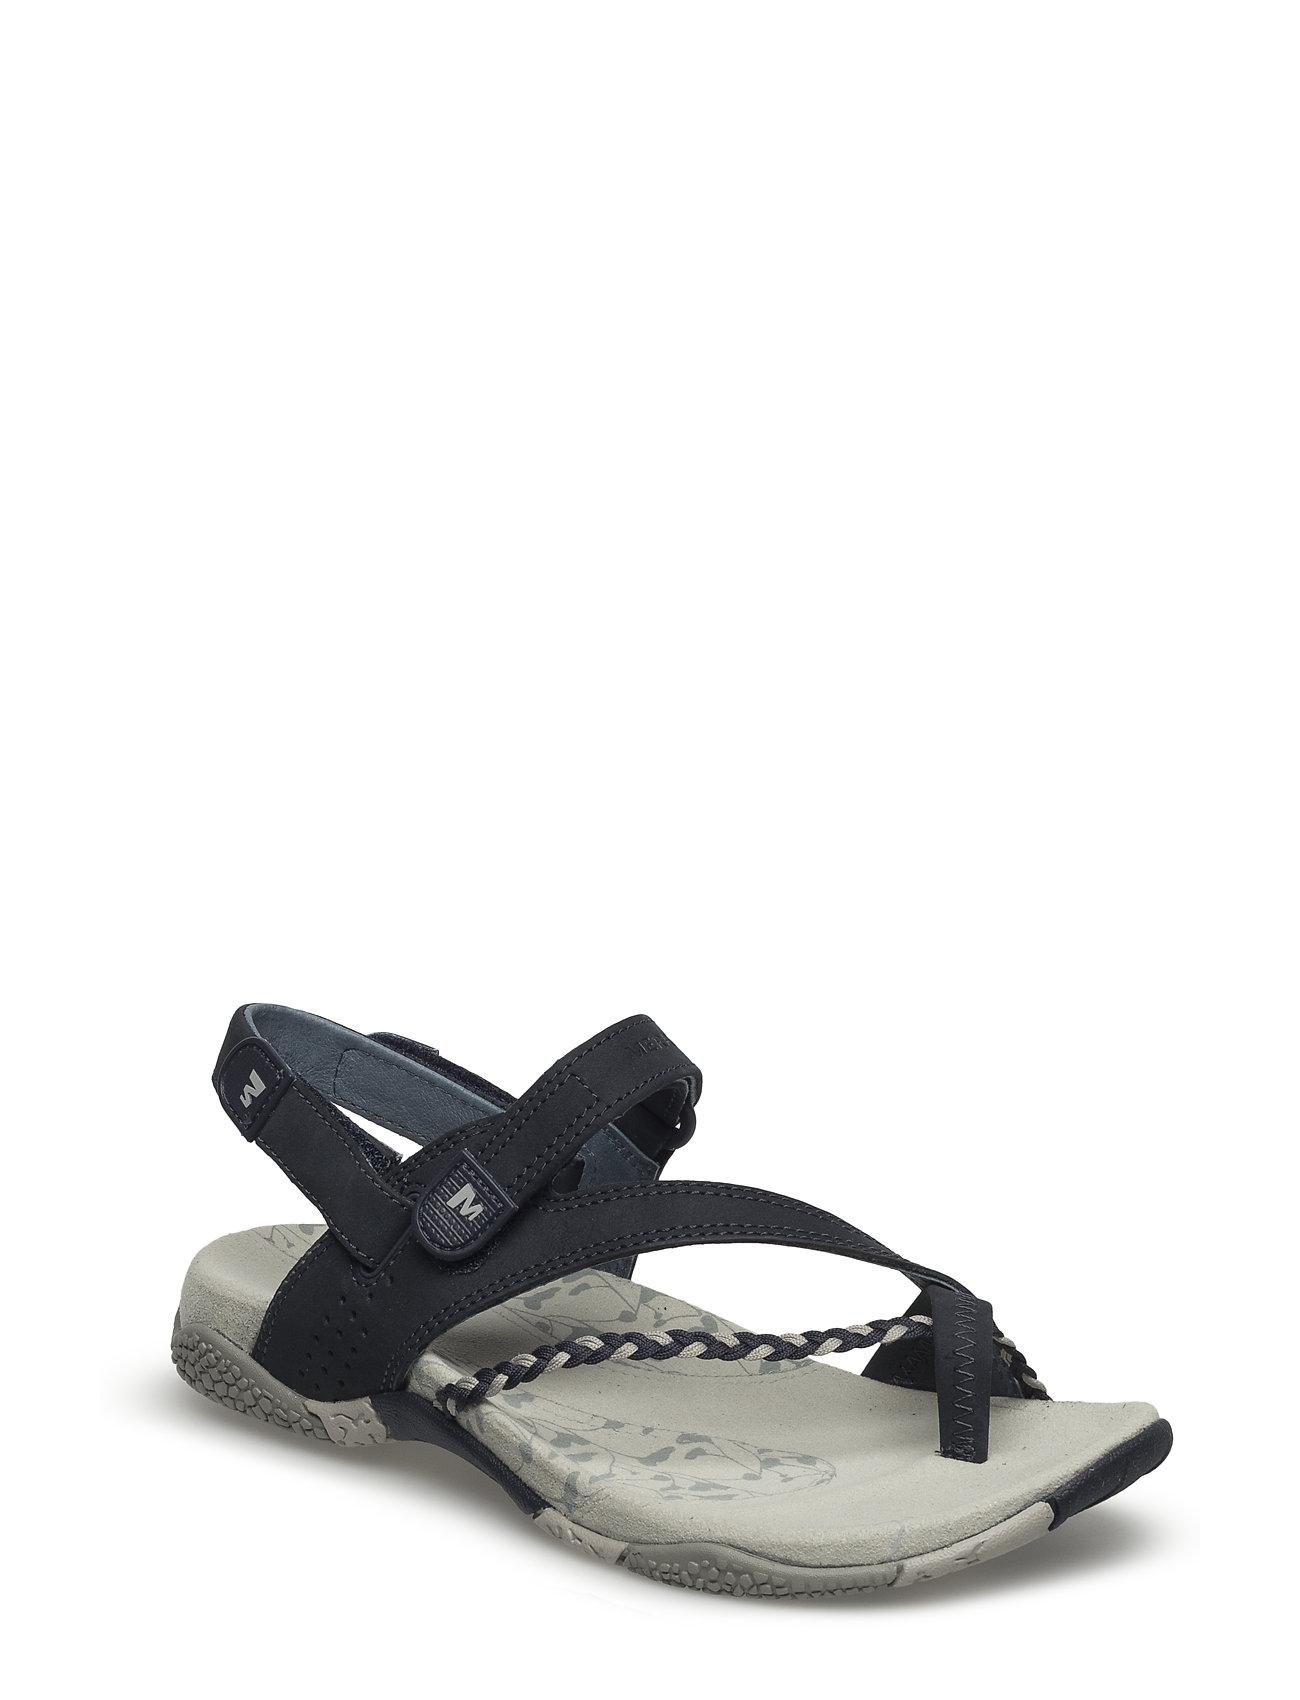 7f6e0dc7c208 Boozt   Women   Shoes   Sandals. Merrell Siena Navy